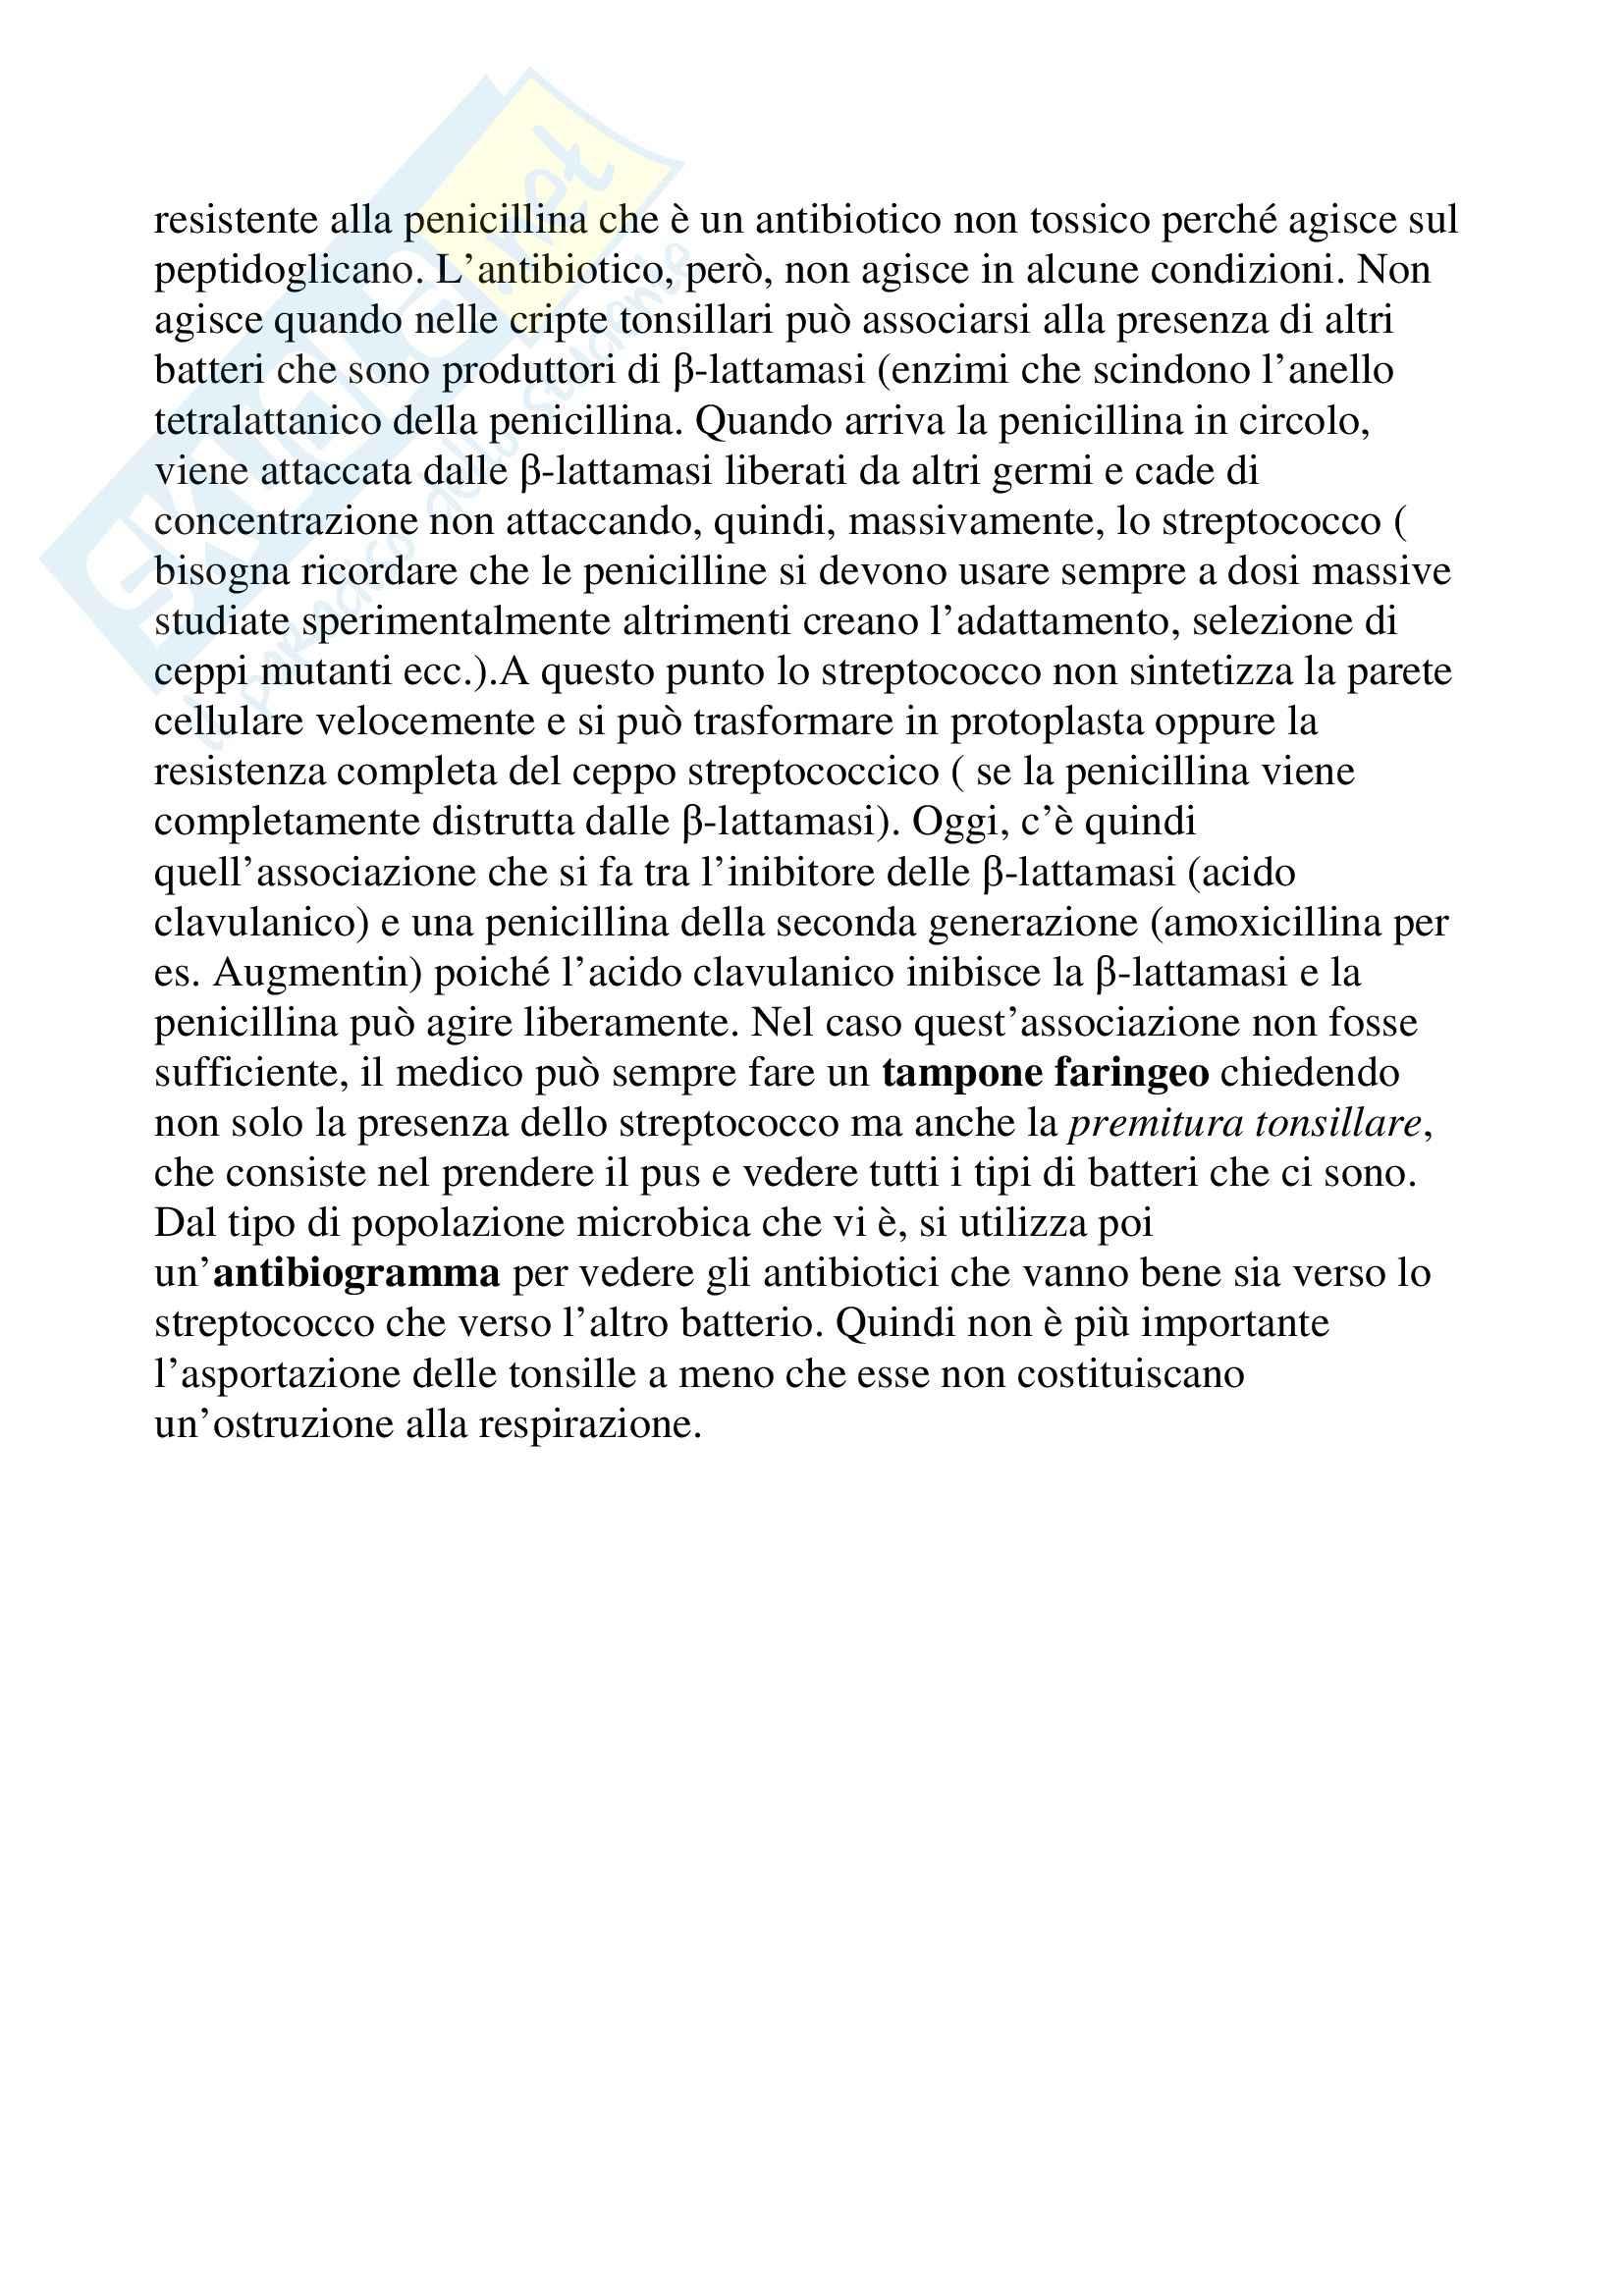 Microbiologia - streptococchi Pag. 11